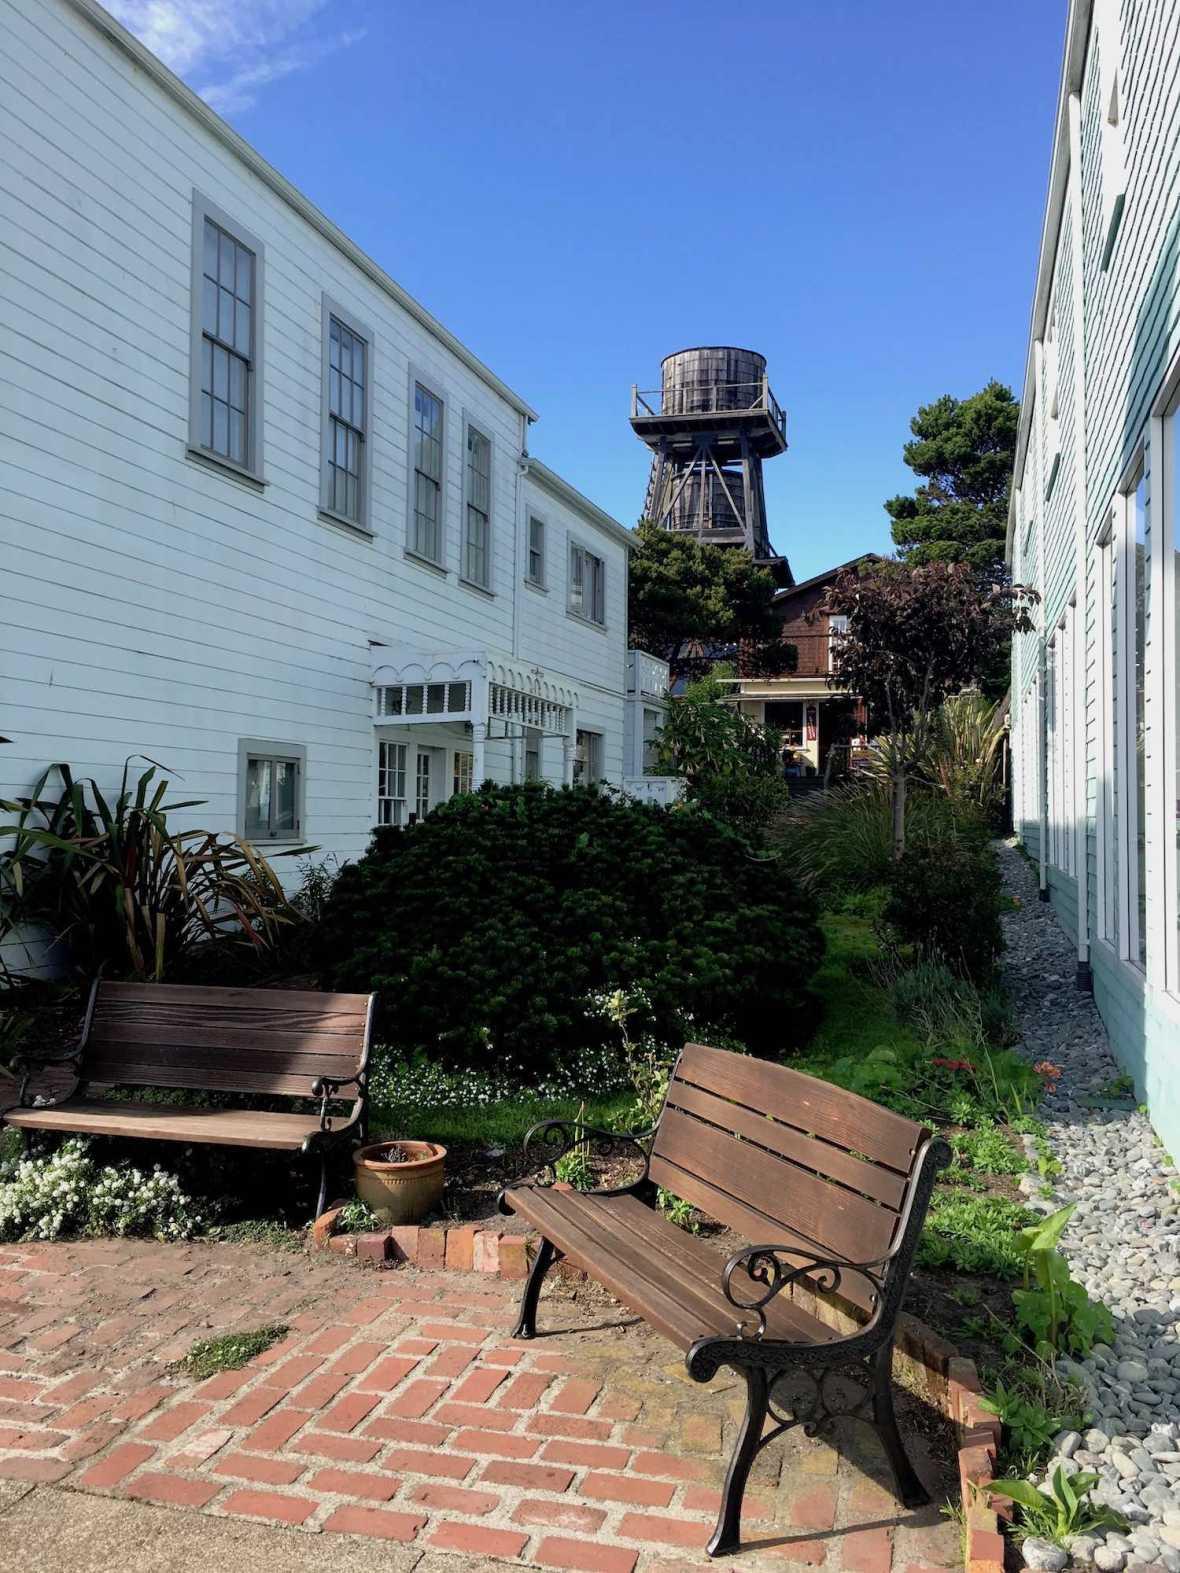 Pocket garden and water tower in Mendocino, California